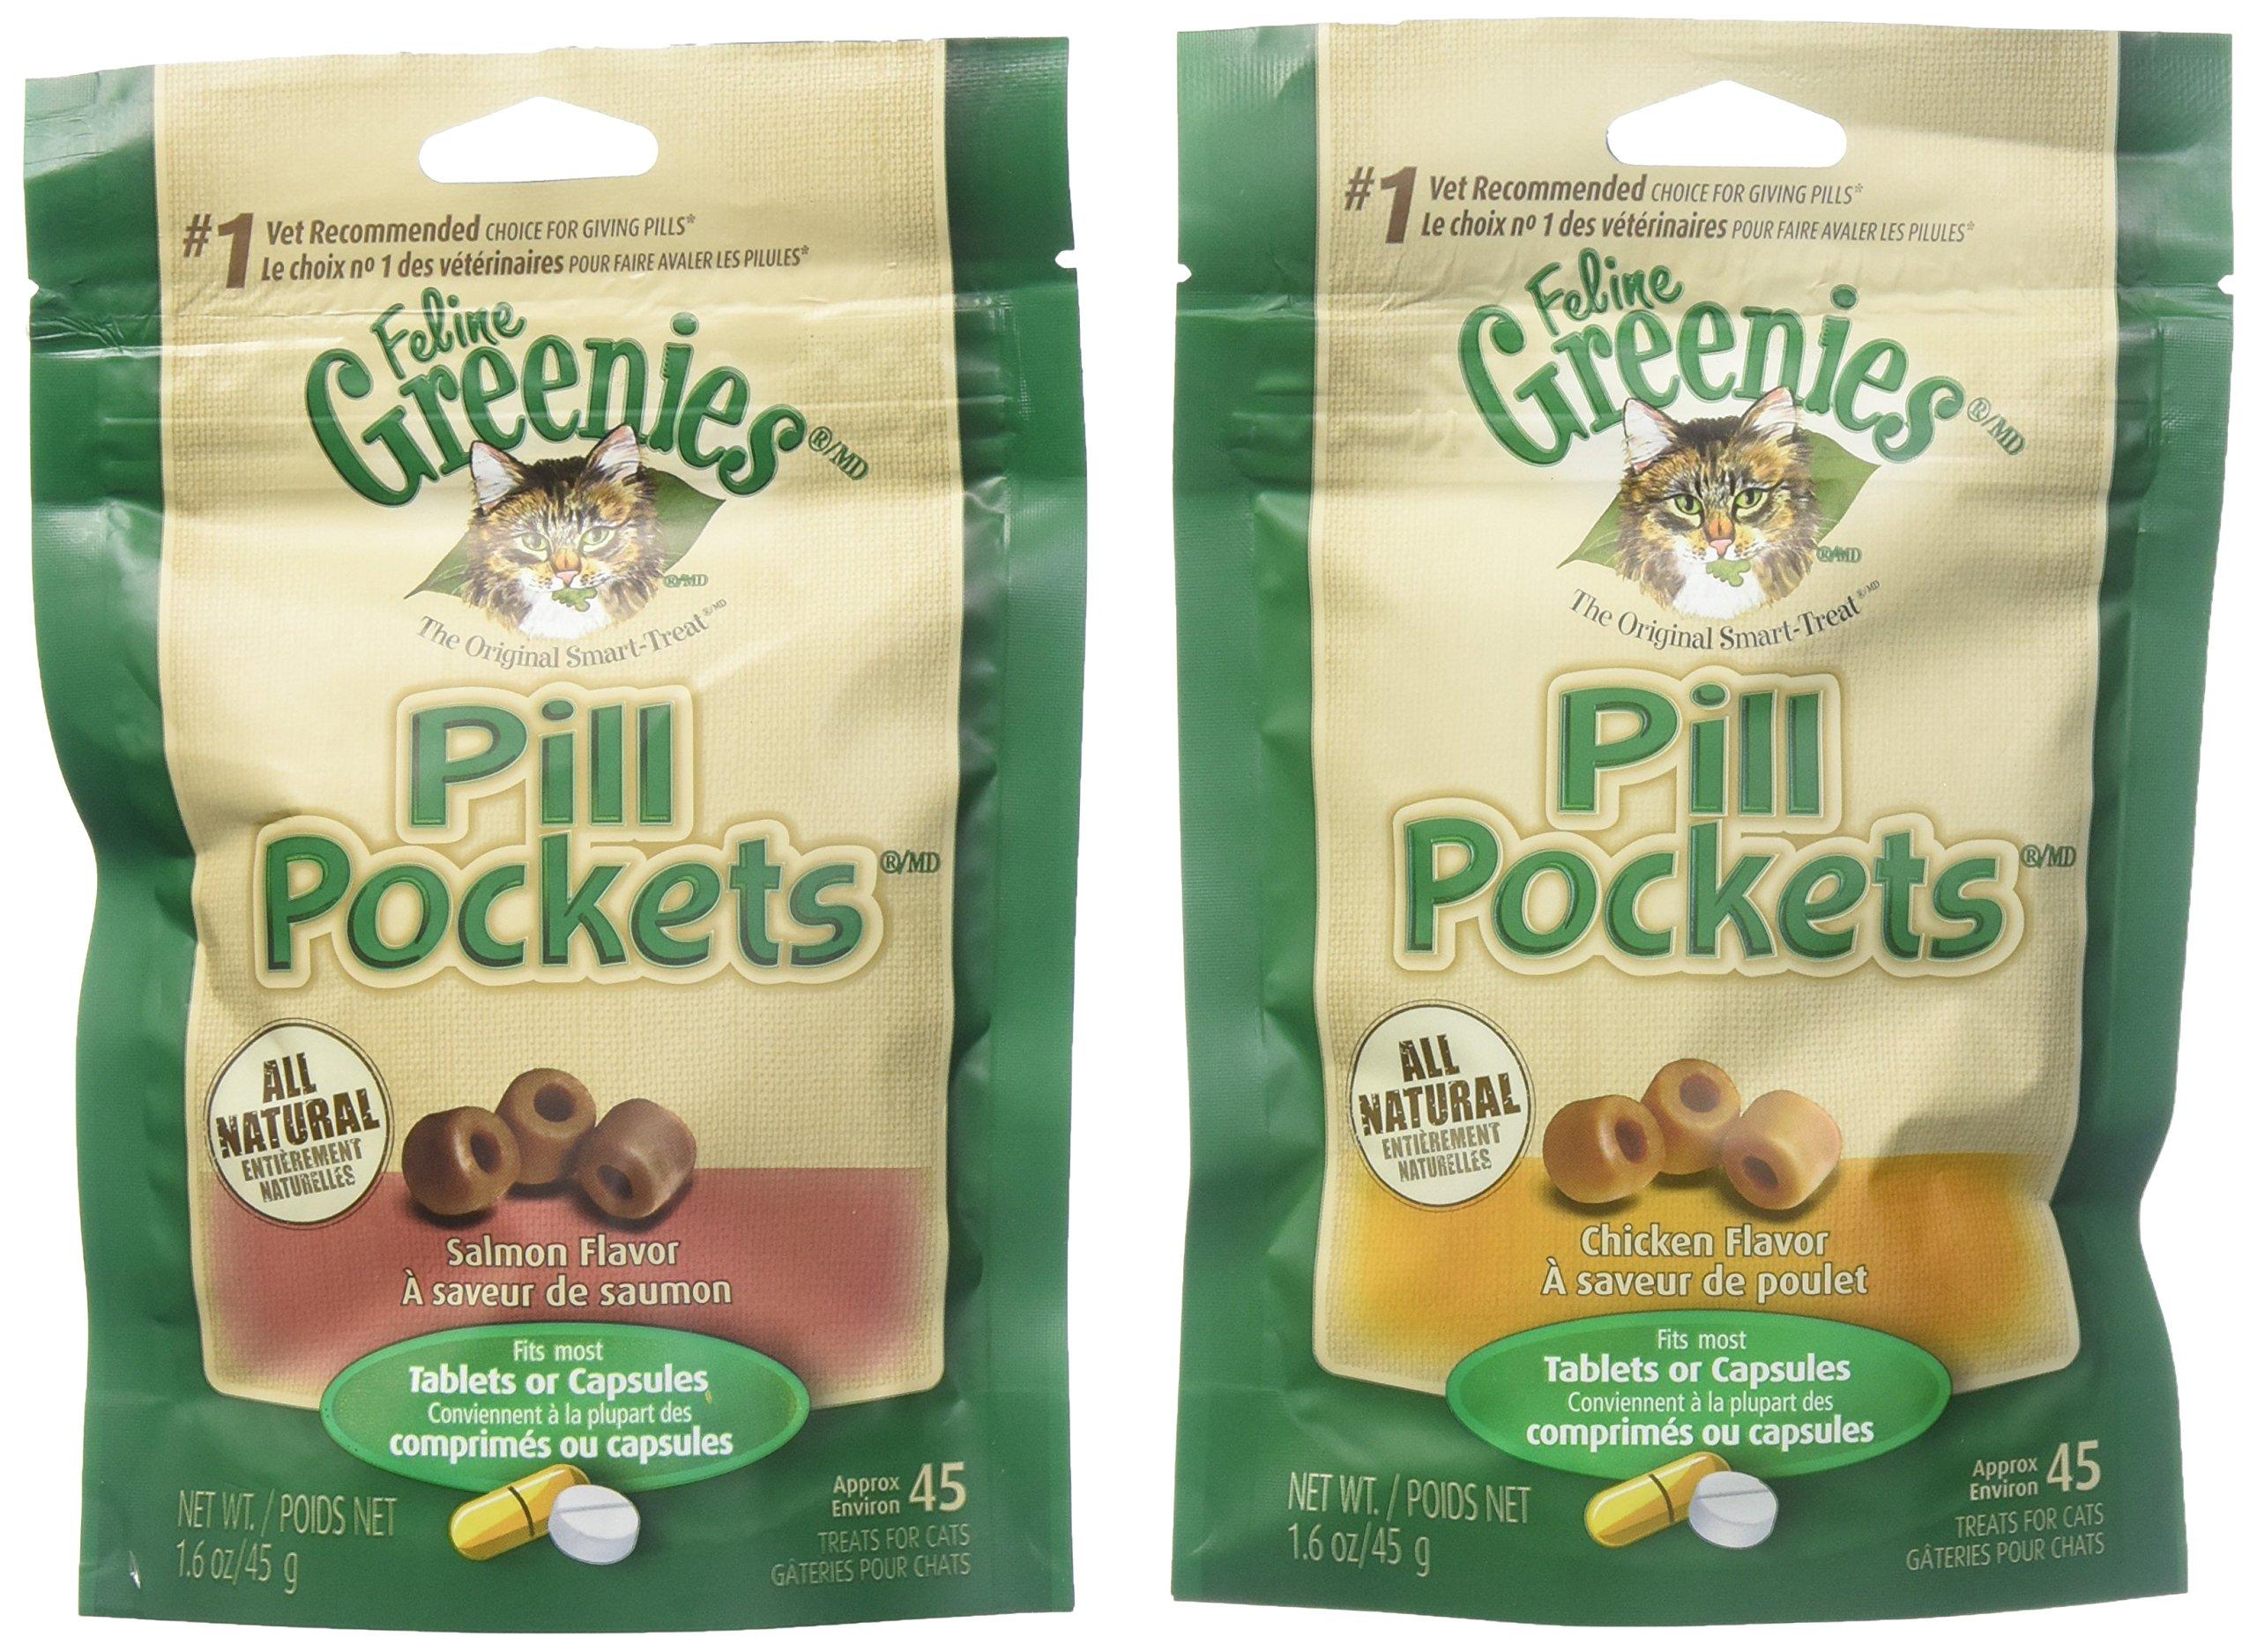 Greenies Pill Pockets - Chicken & Salmon Bundle by Greenies